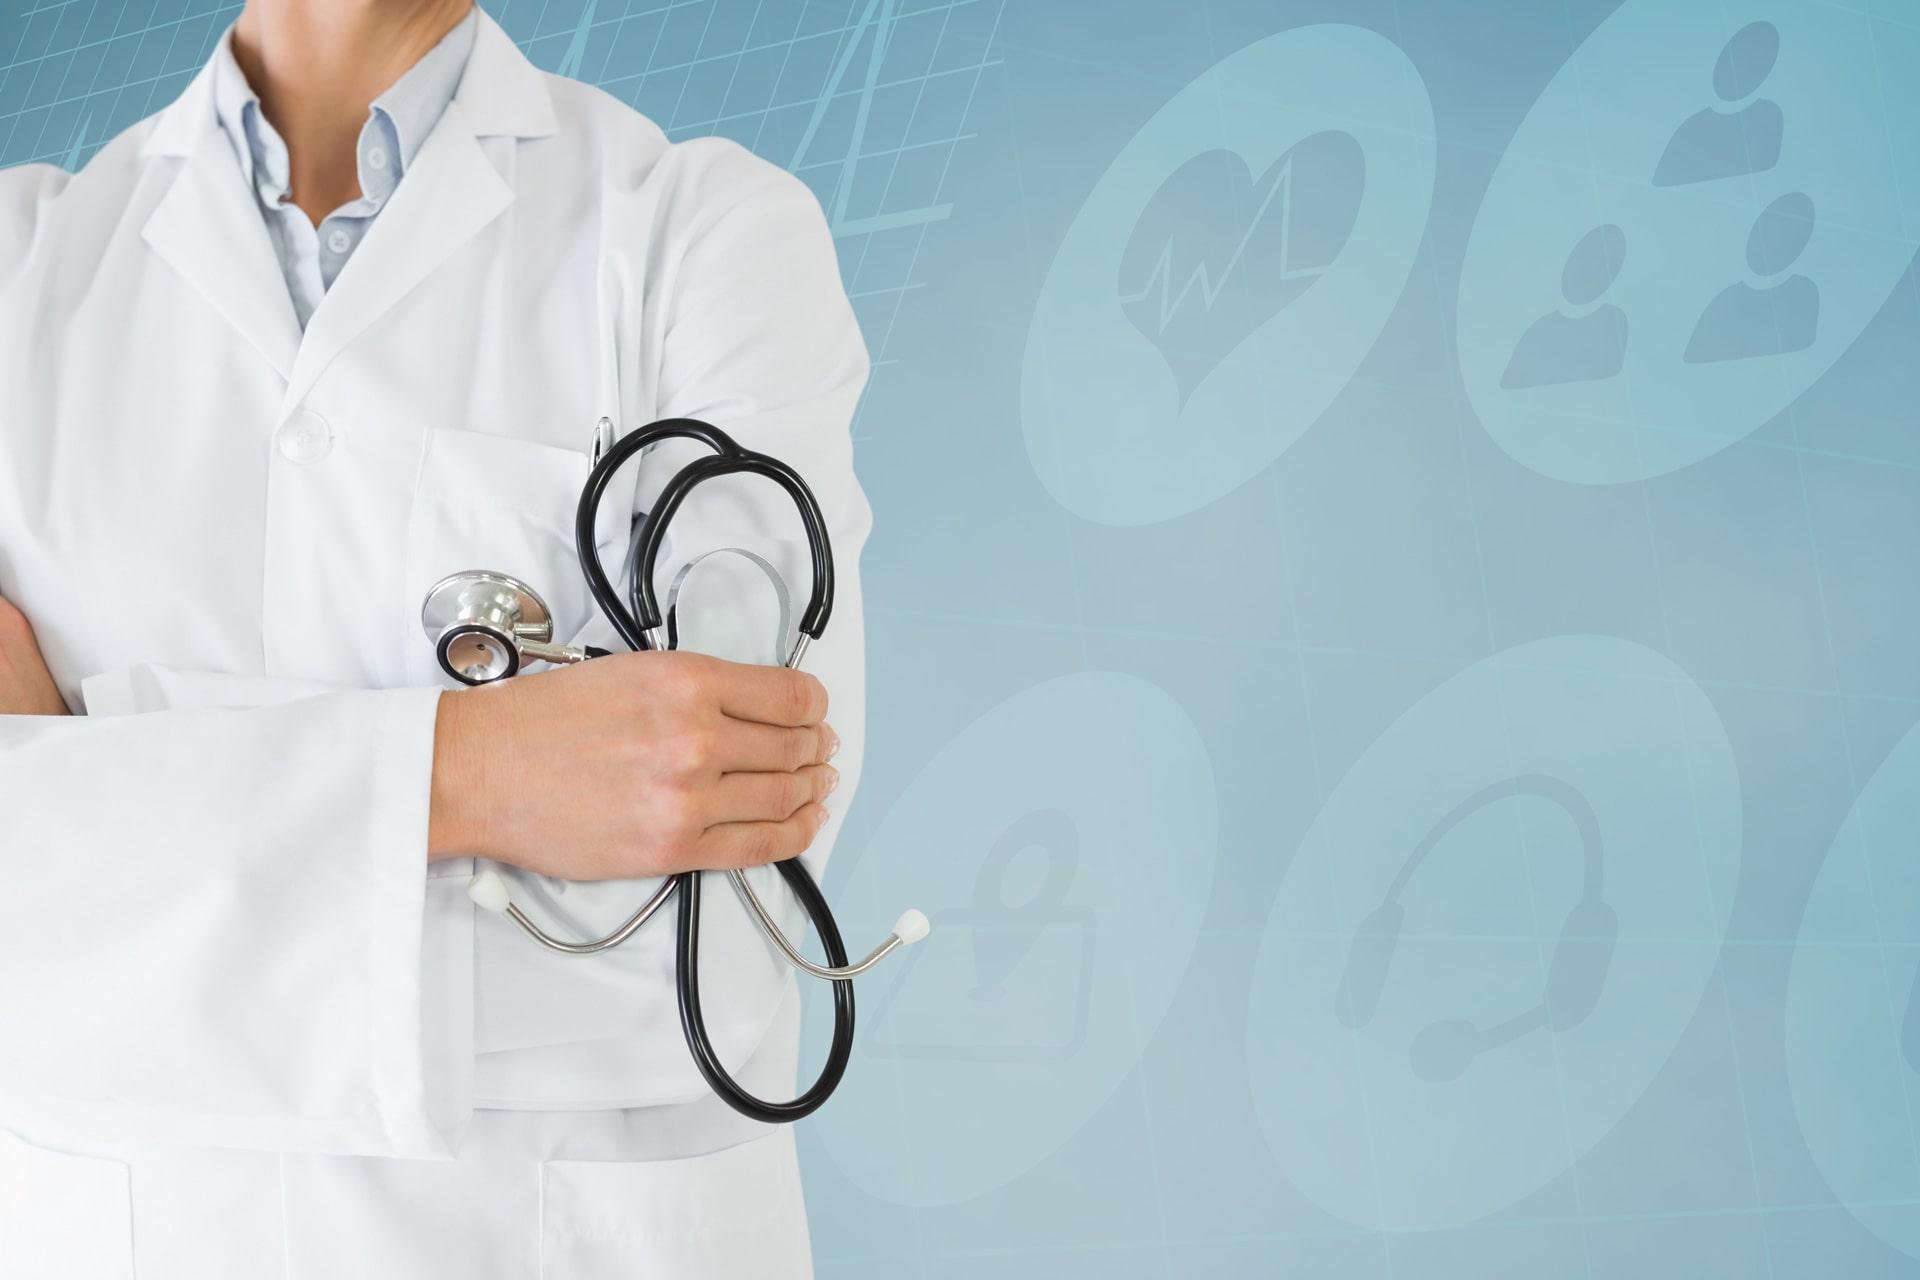 mobile urological clinics